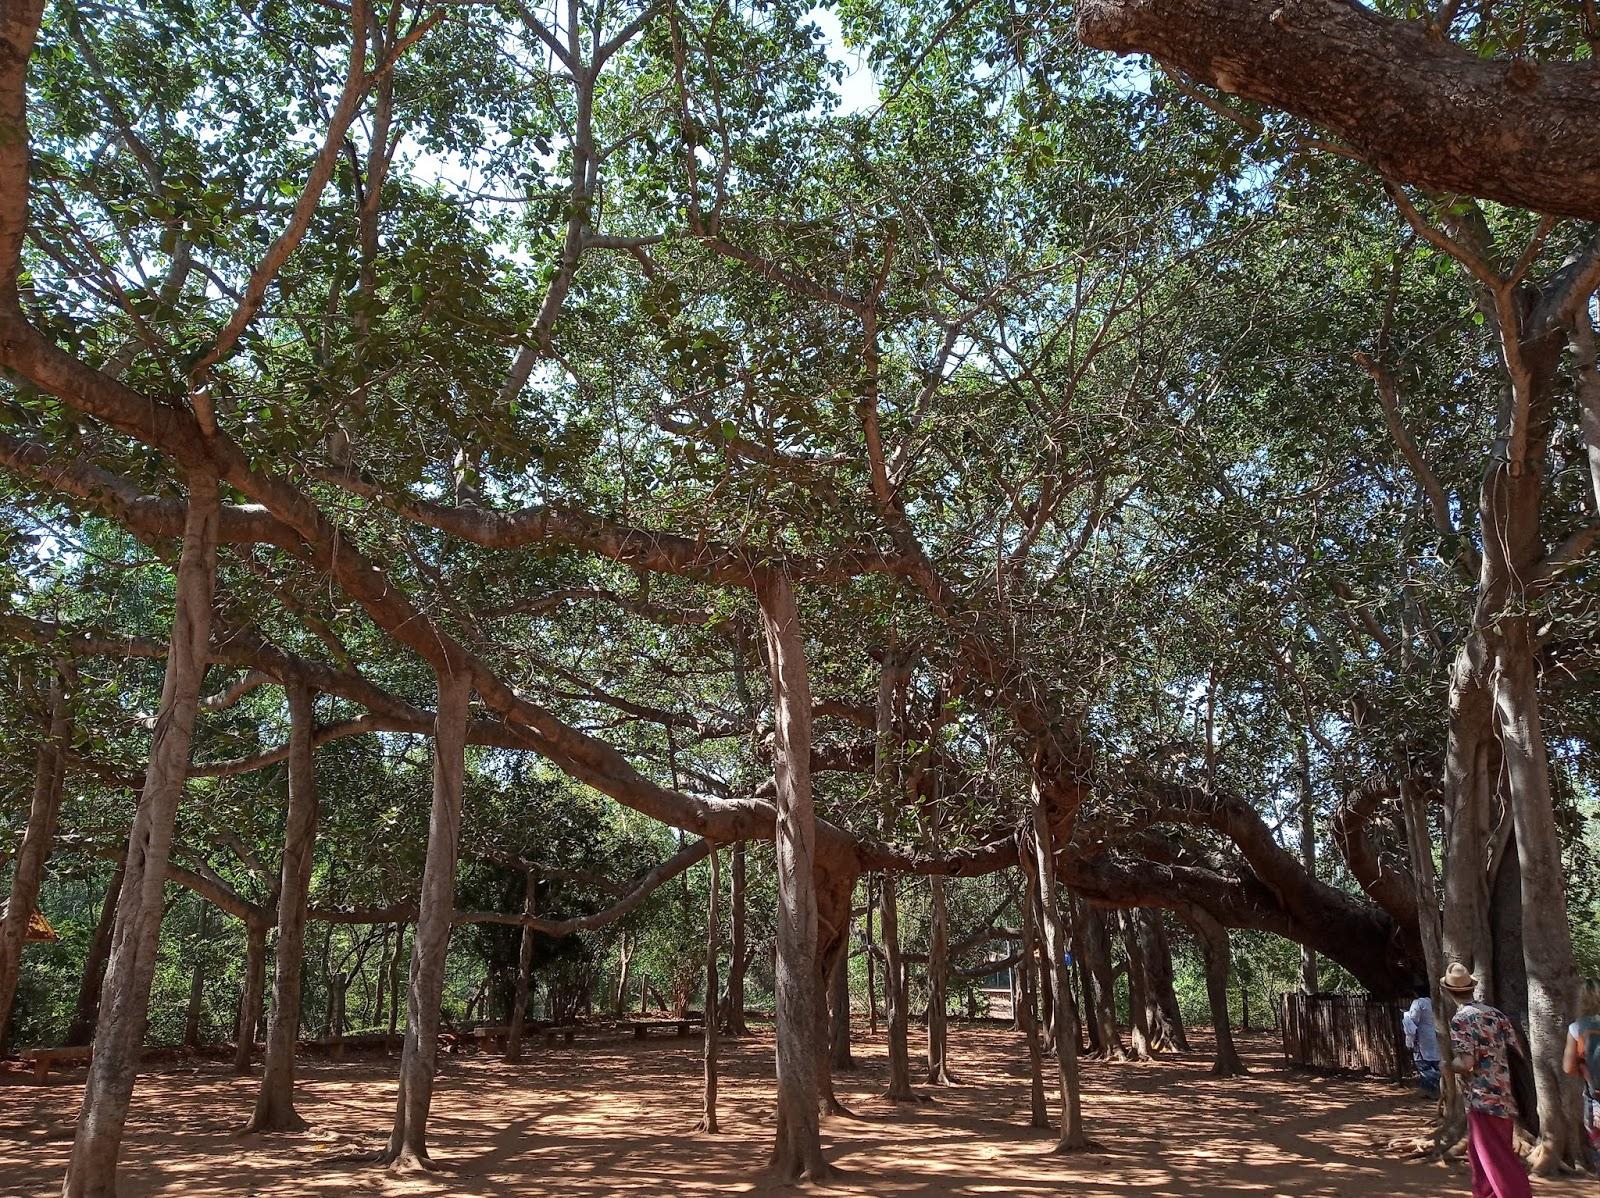 Banyan tree Auroville, India | Ummi Goes Where?